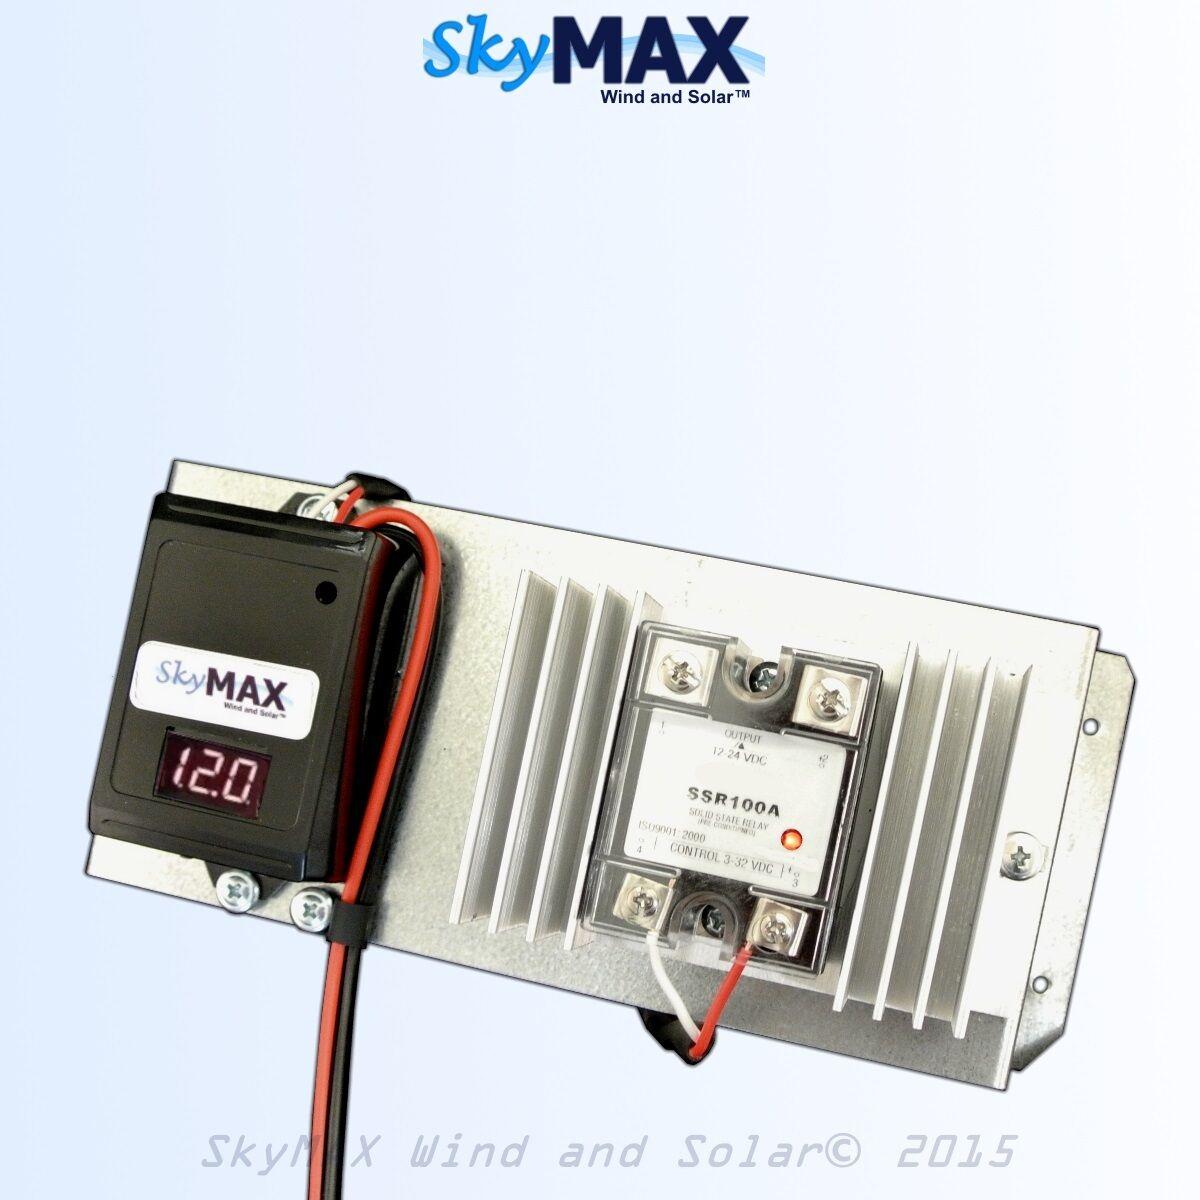 12 v 100 amp solid state digital charge controller for solar panels